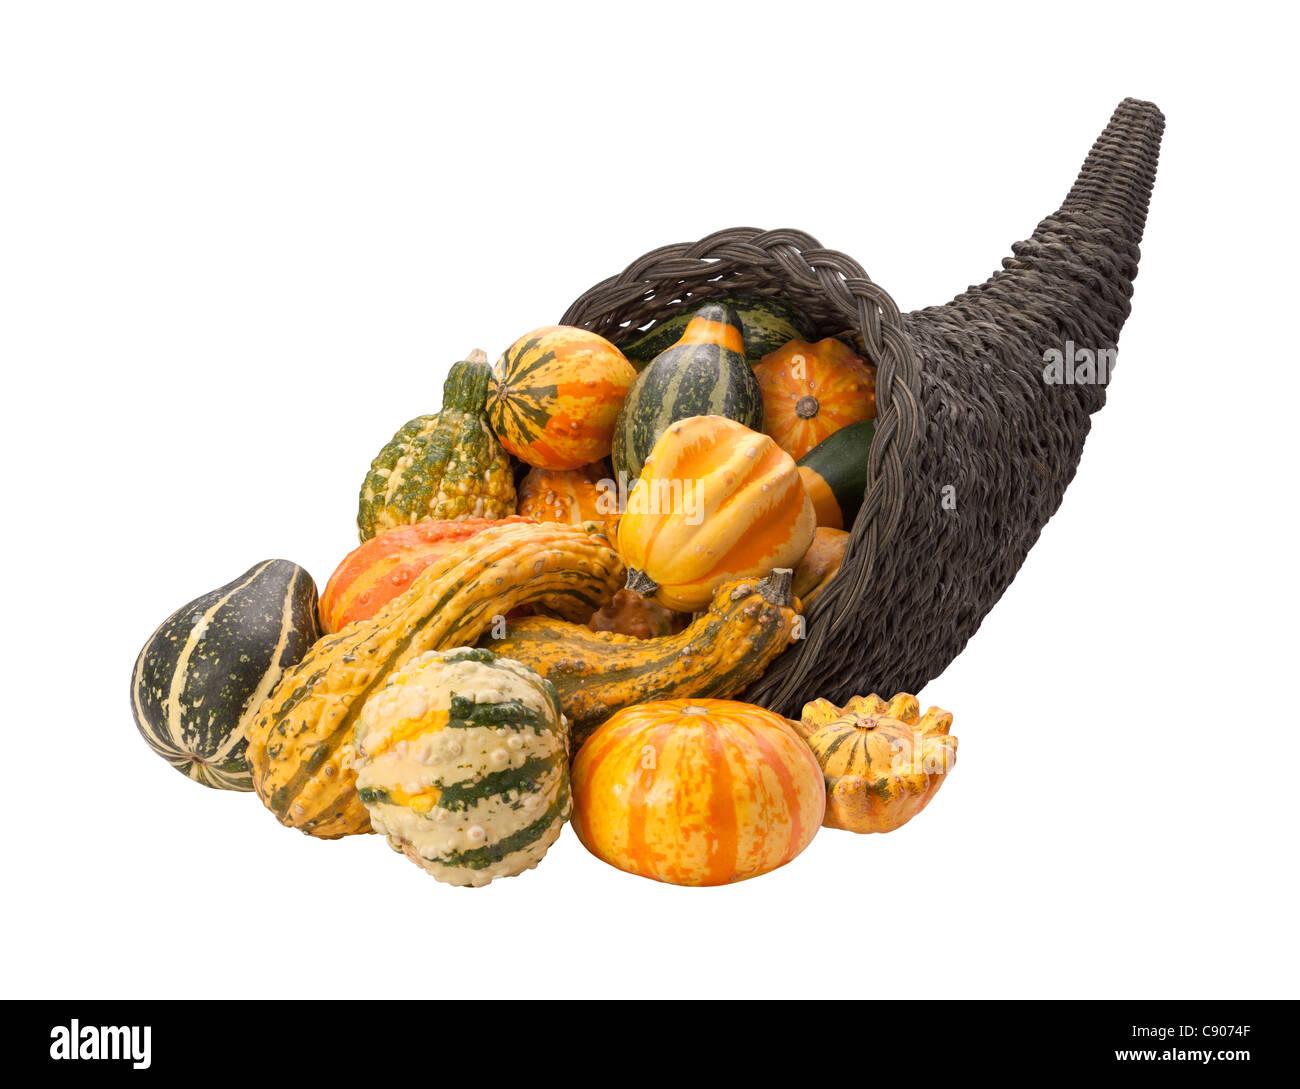 Cornucopia Gourds Isolated on a white background. - Stock Image